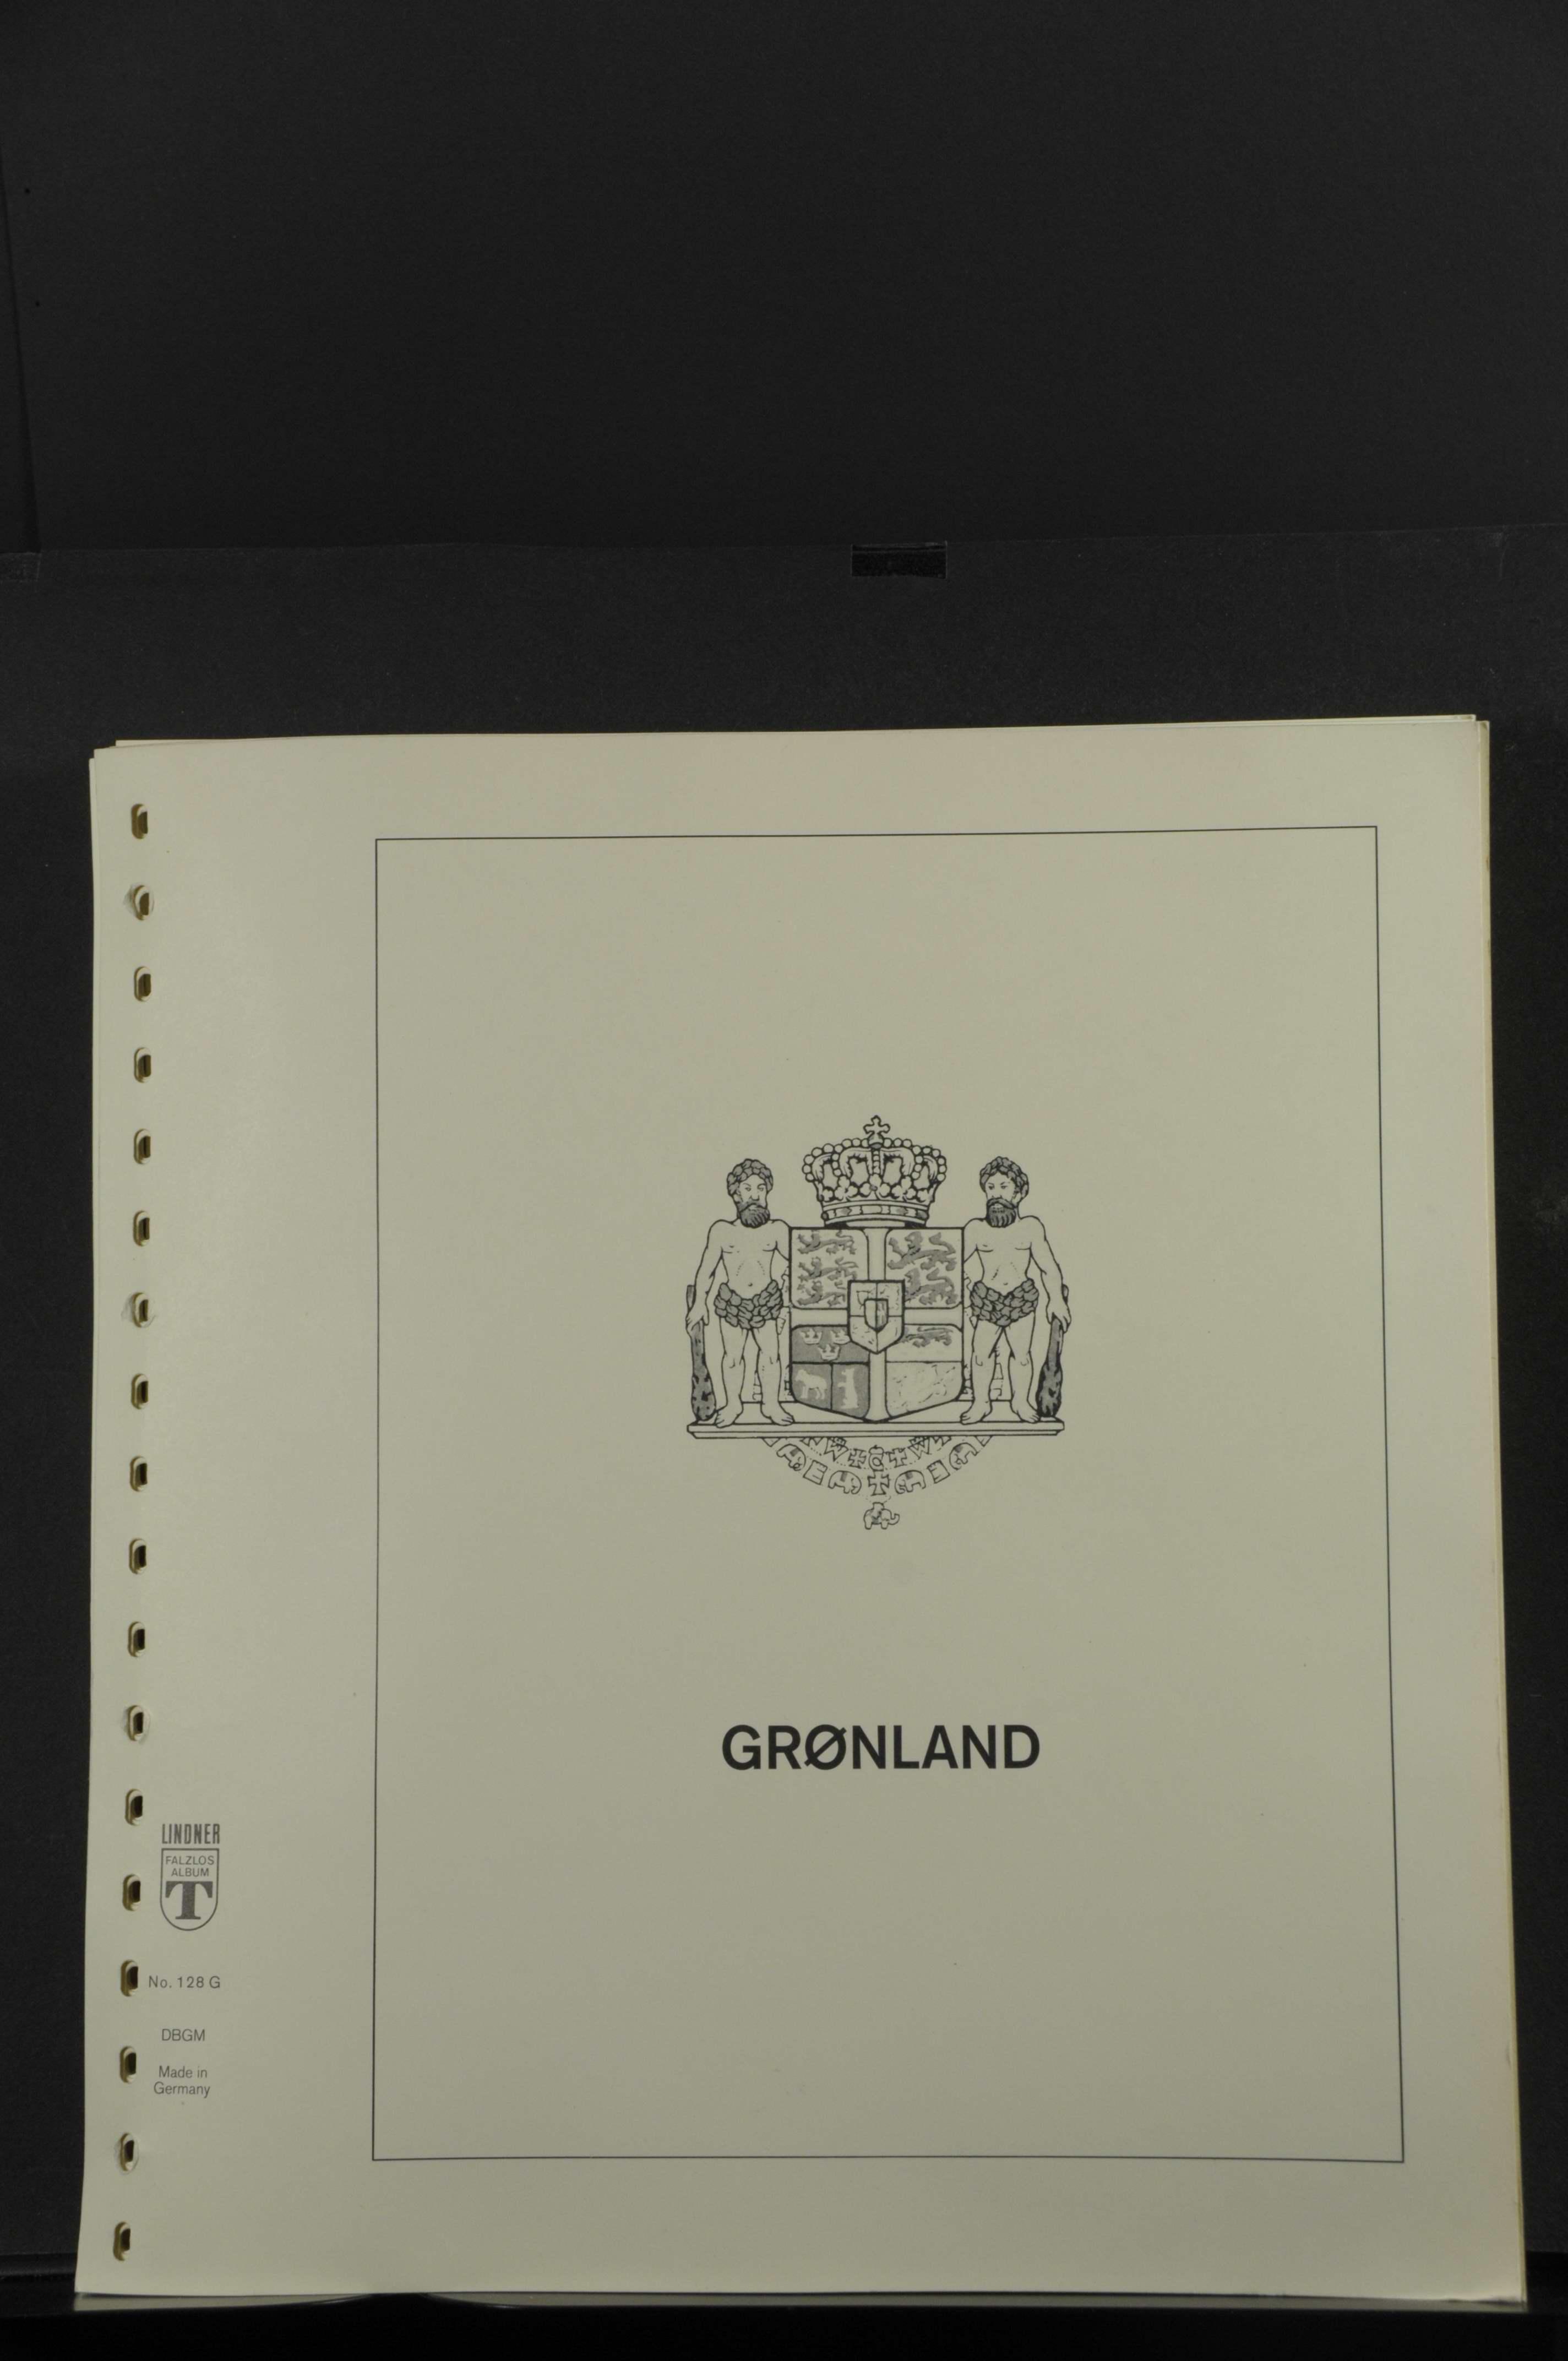 Lot 7558 - Europa A-Z Dänemark - Grönland -  Auktionshaus Ulrich Felzmann GmbH & Co. KG